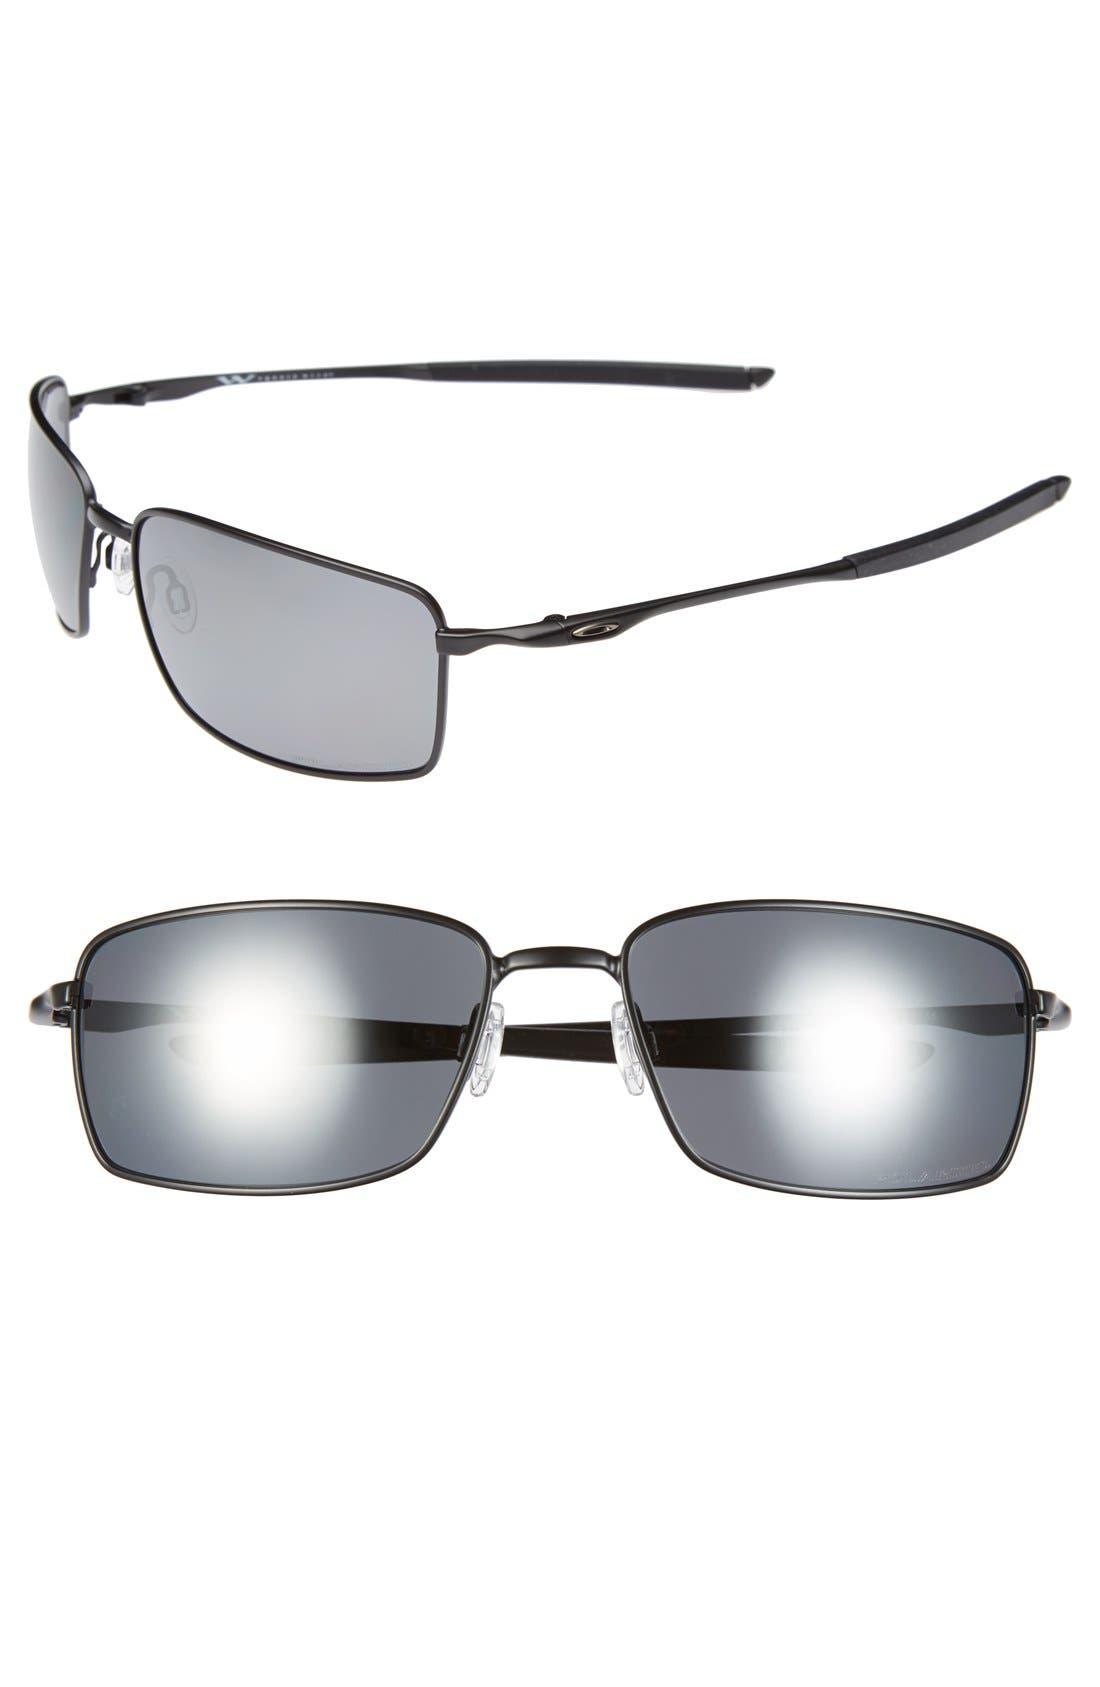 60mm Polarized Sunglasses,                             Main thumbnail 1, color,                             001